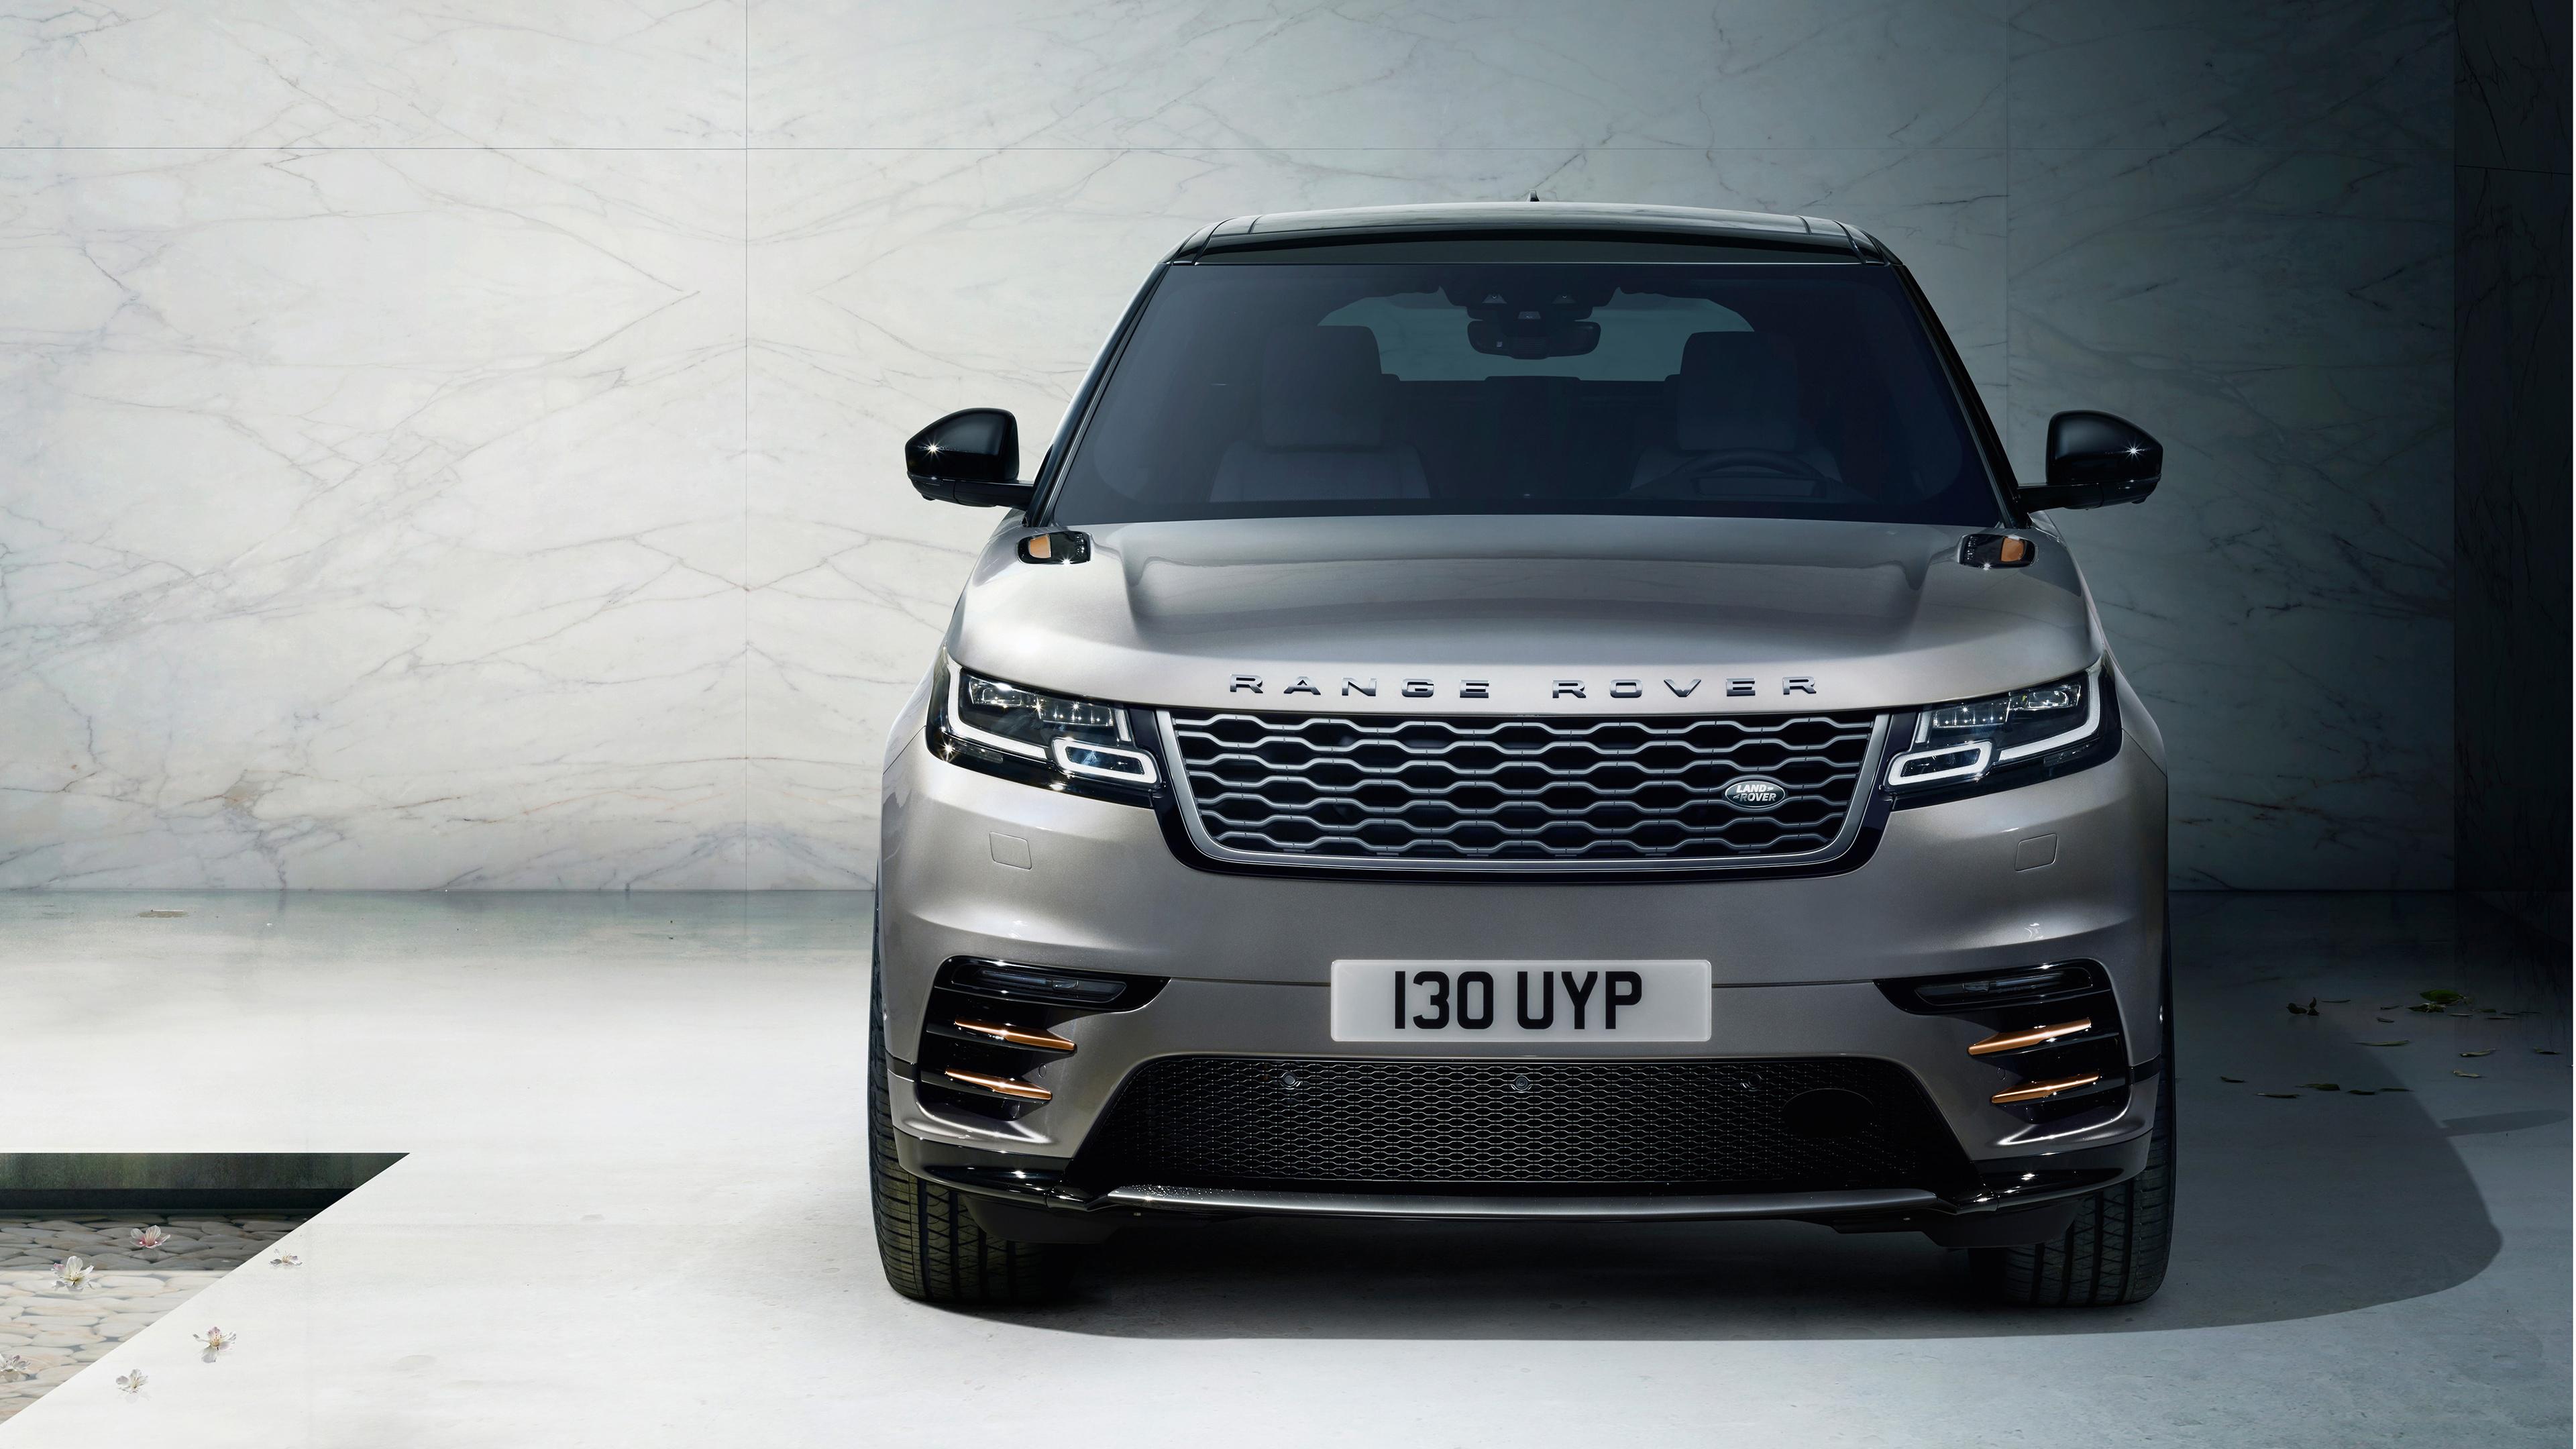 range rover velar 2018 1539105067 - Range Rover Velar 2018 - range rover wallpapers, range rover velar wallpapers, land rover wallpapers, cars wallpapers, 2018 cars wallpapers